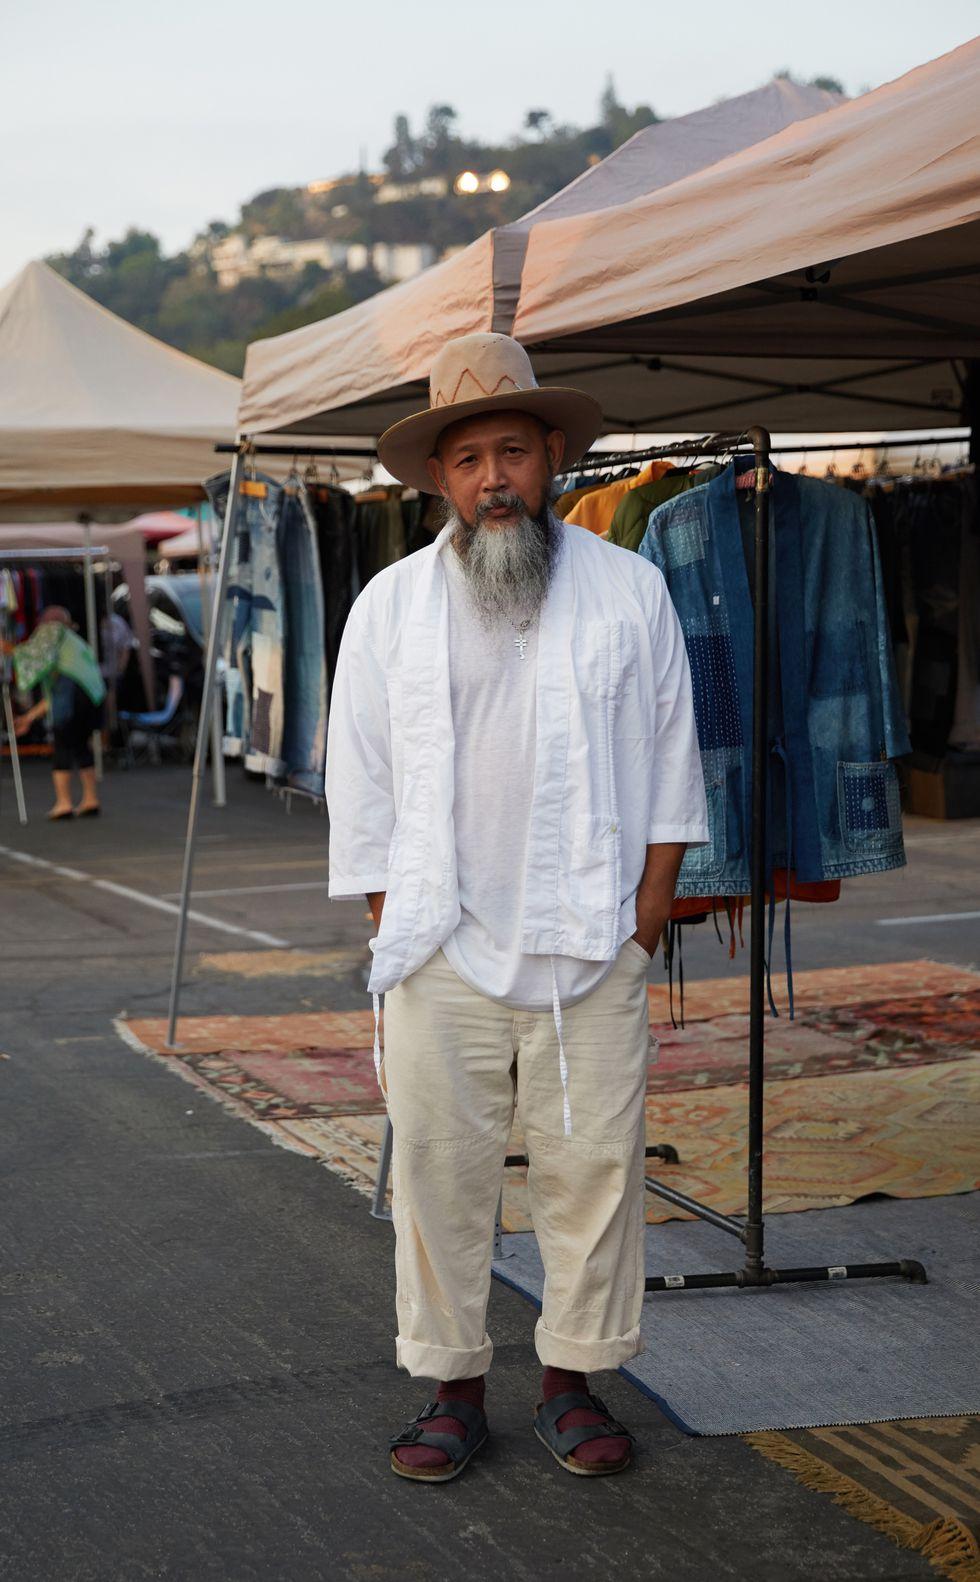 phong cach vintage - Zee Bernardo is the owner of the shop Seulement - elle man